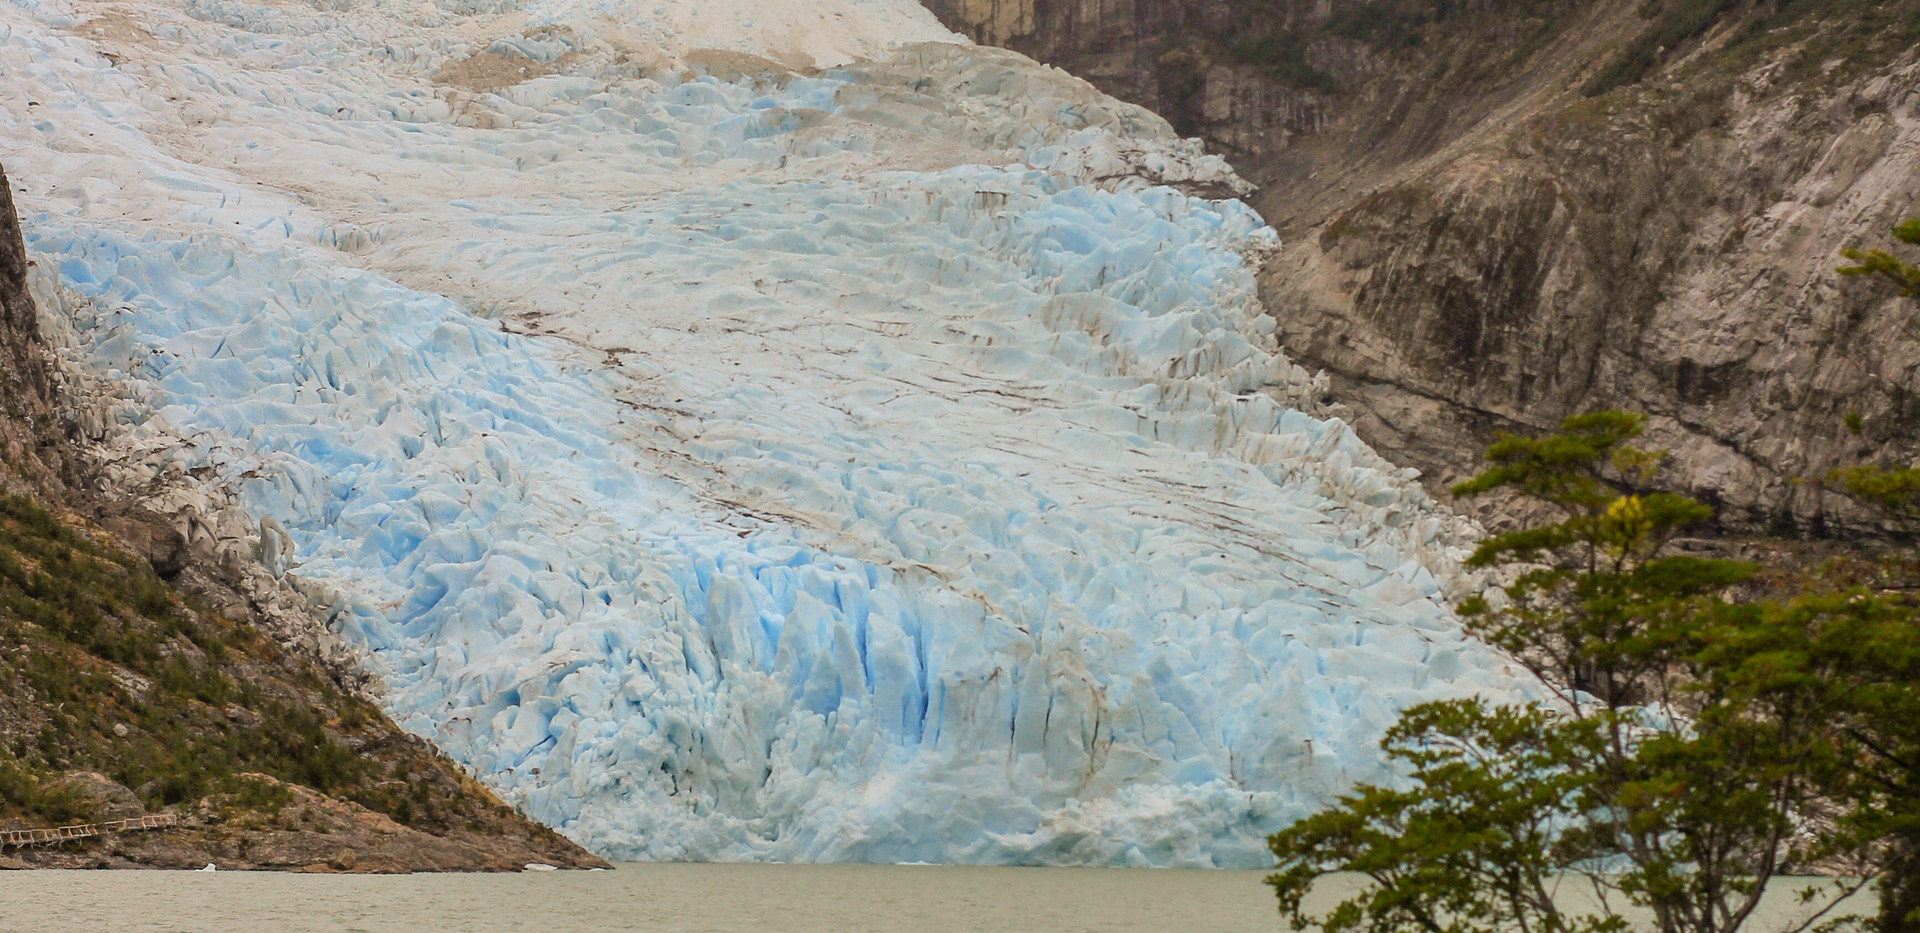 Glaciar Balmaceda 2.jpg